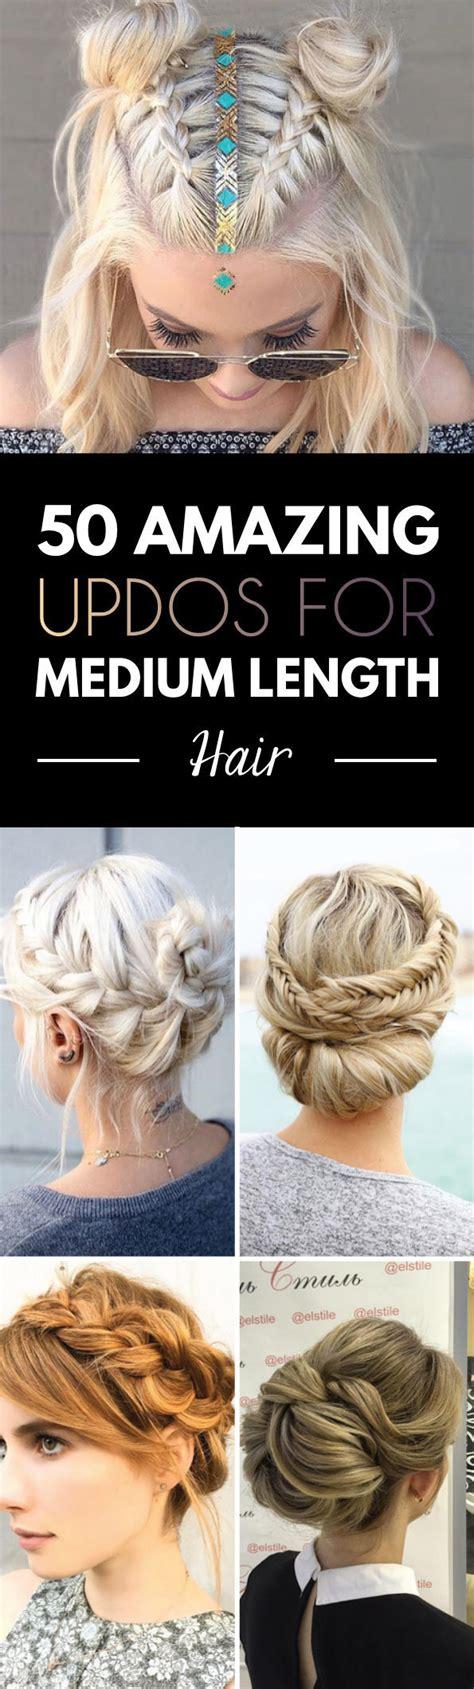 Wedding Hairstyles For Medium Length Hair Step By Step by 50 Amazing Updos For Medium Length Hair Style Skinner